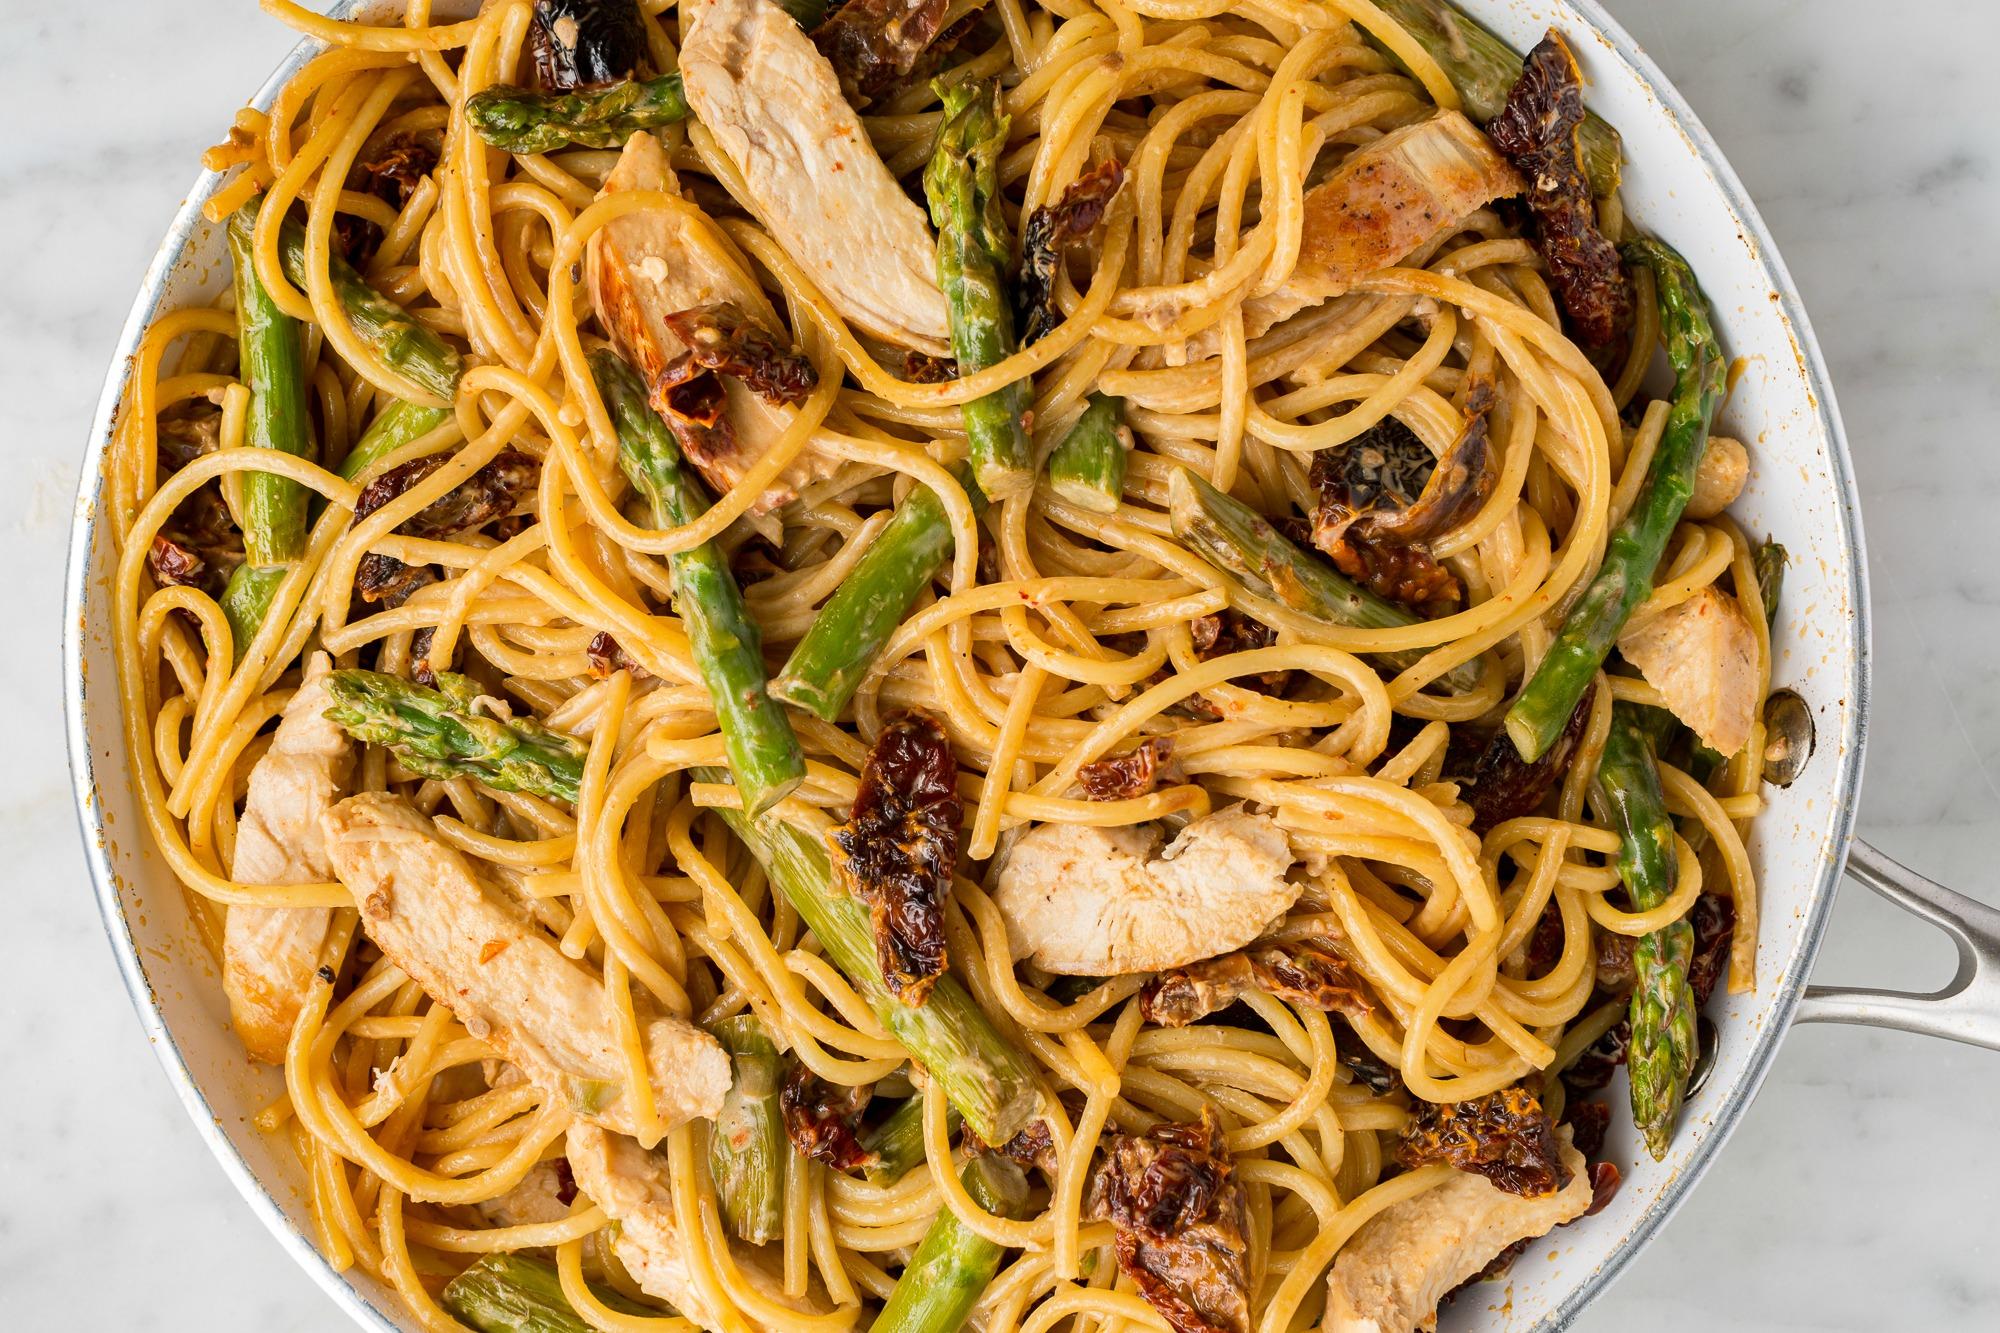 60 Best Spaghetti Recipes Easy Ideas For Spaghetti Pasta